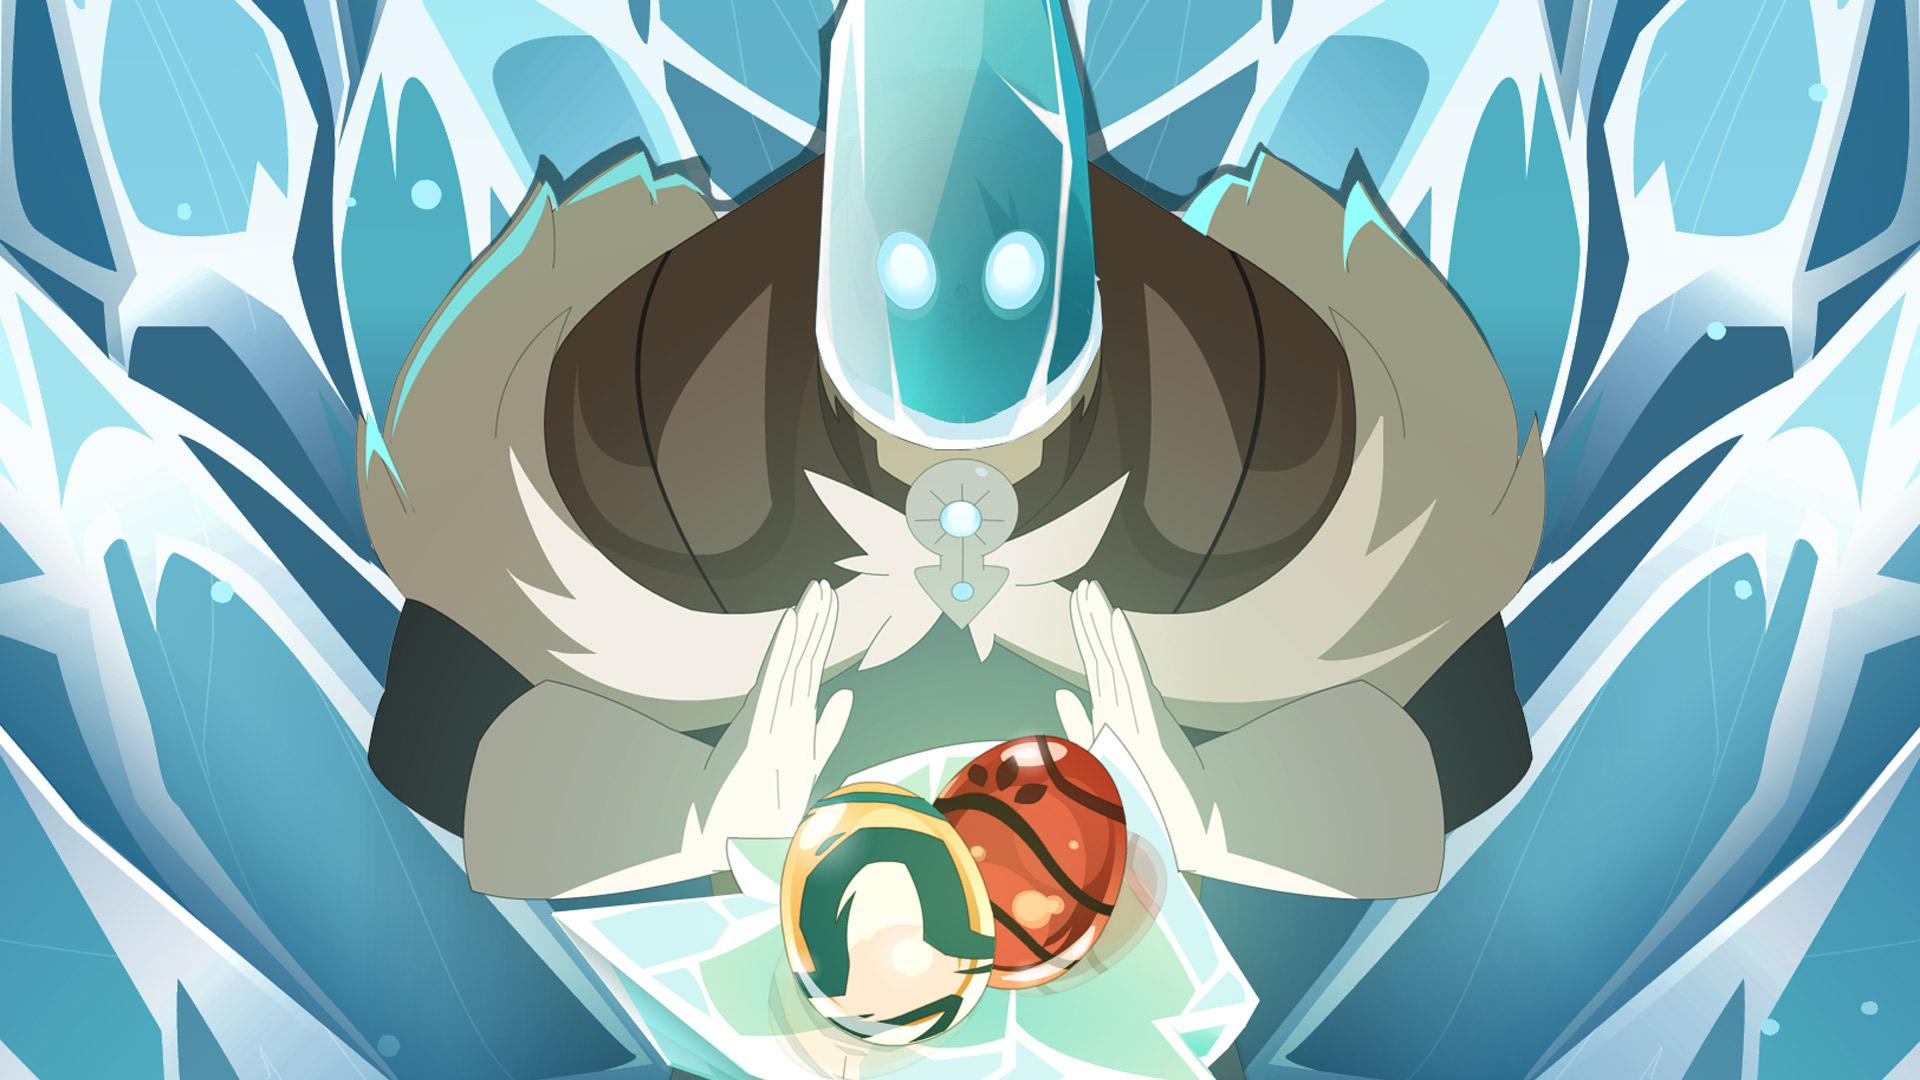 Animal Crossing New Leaf Sable Porn showcase :: wakfu - book i: the throne of ice